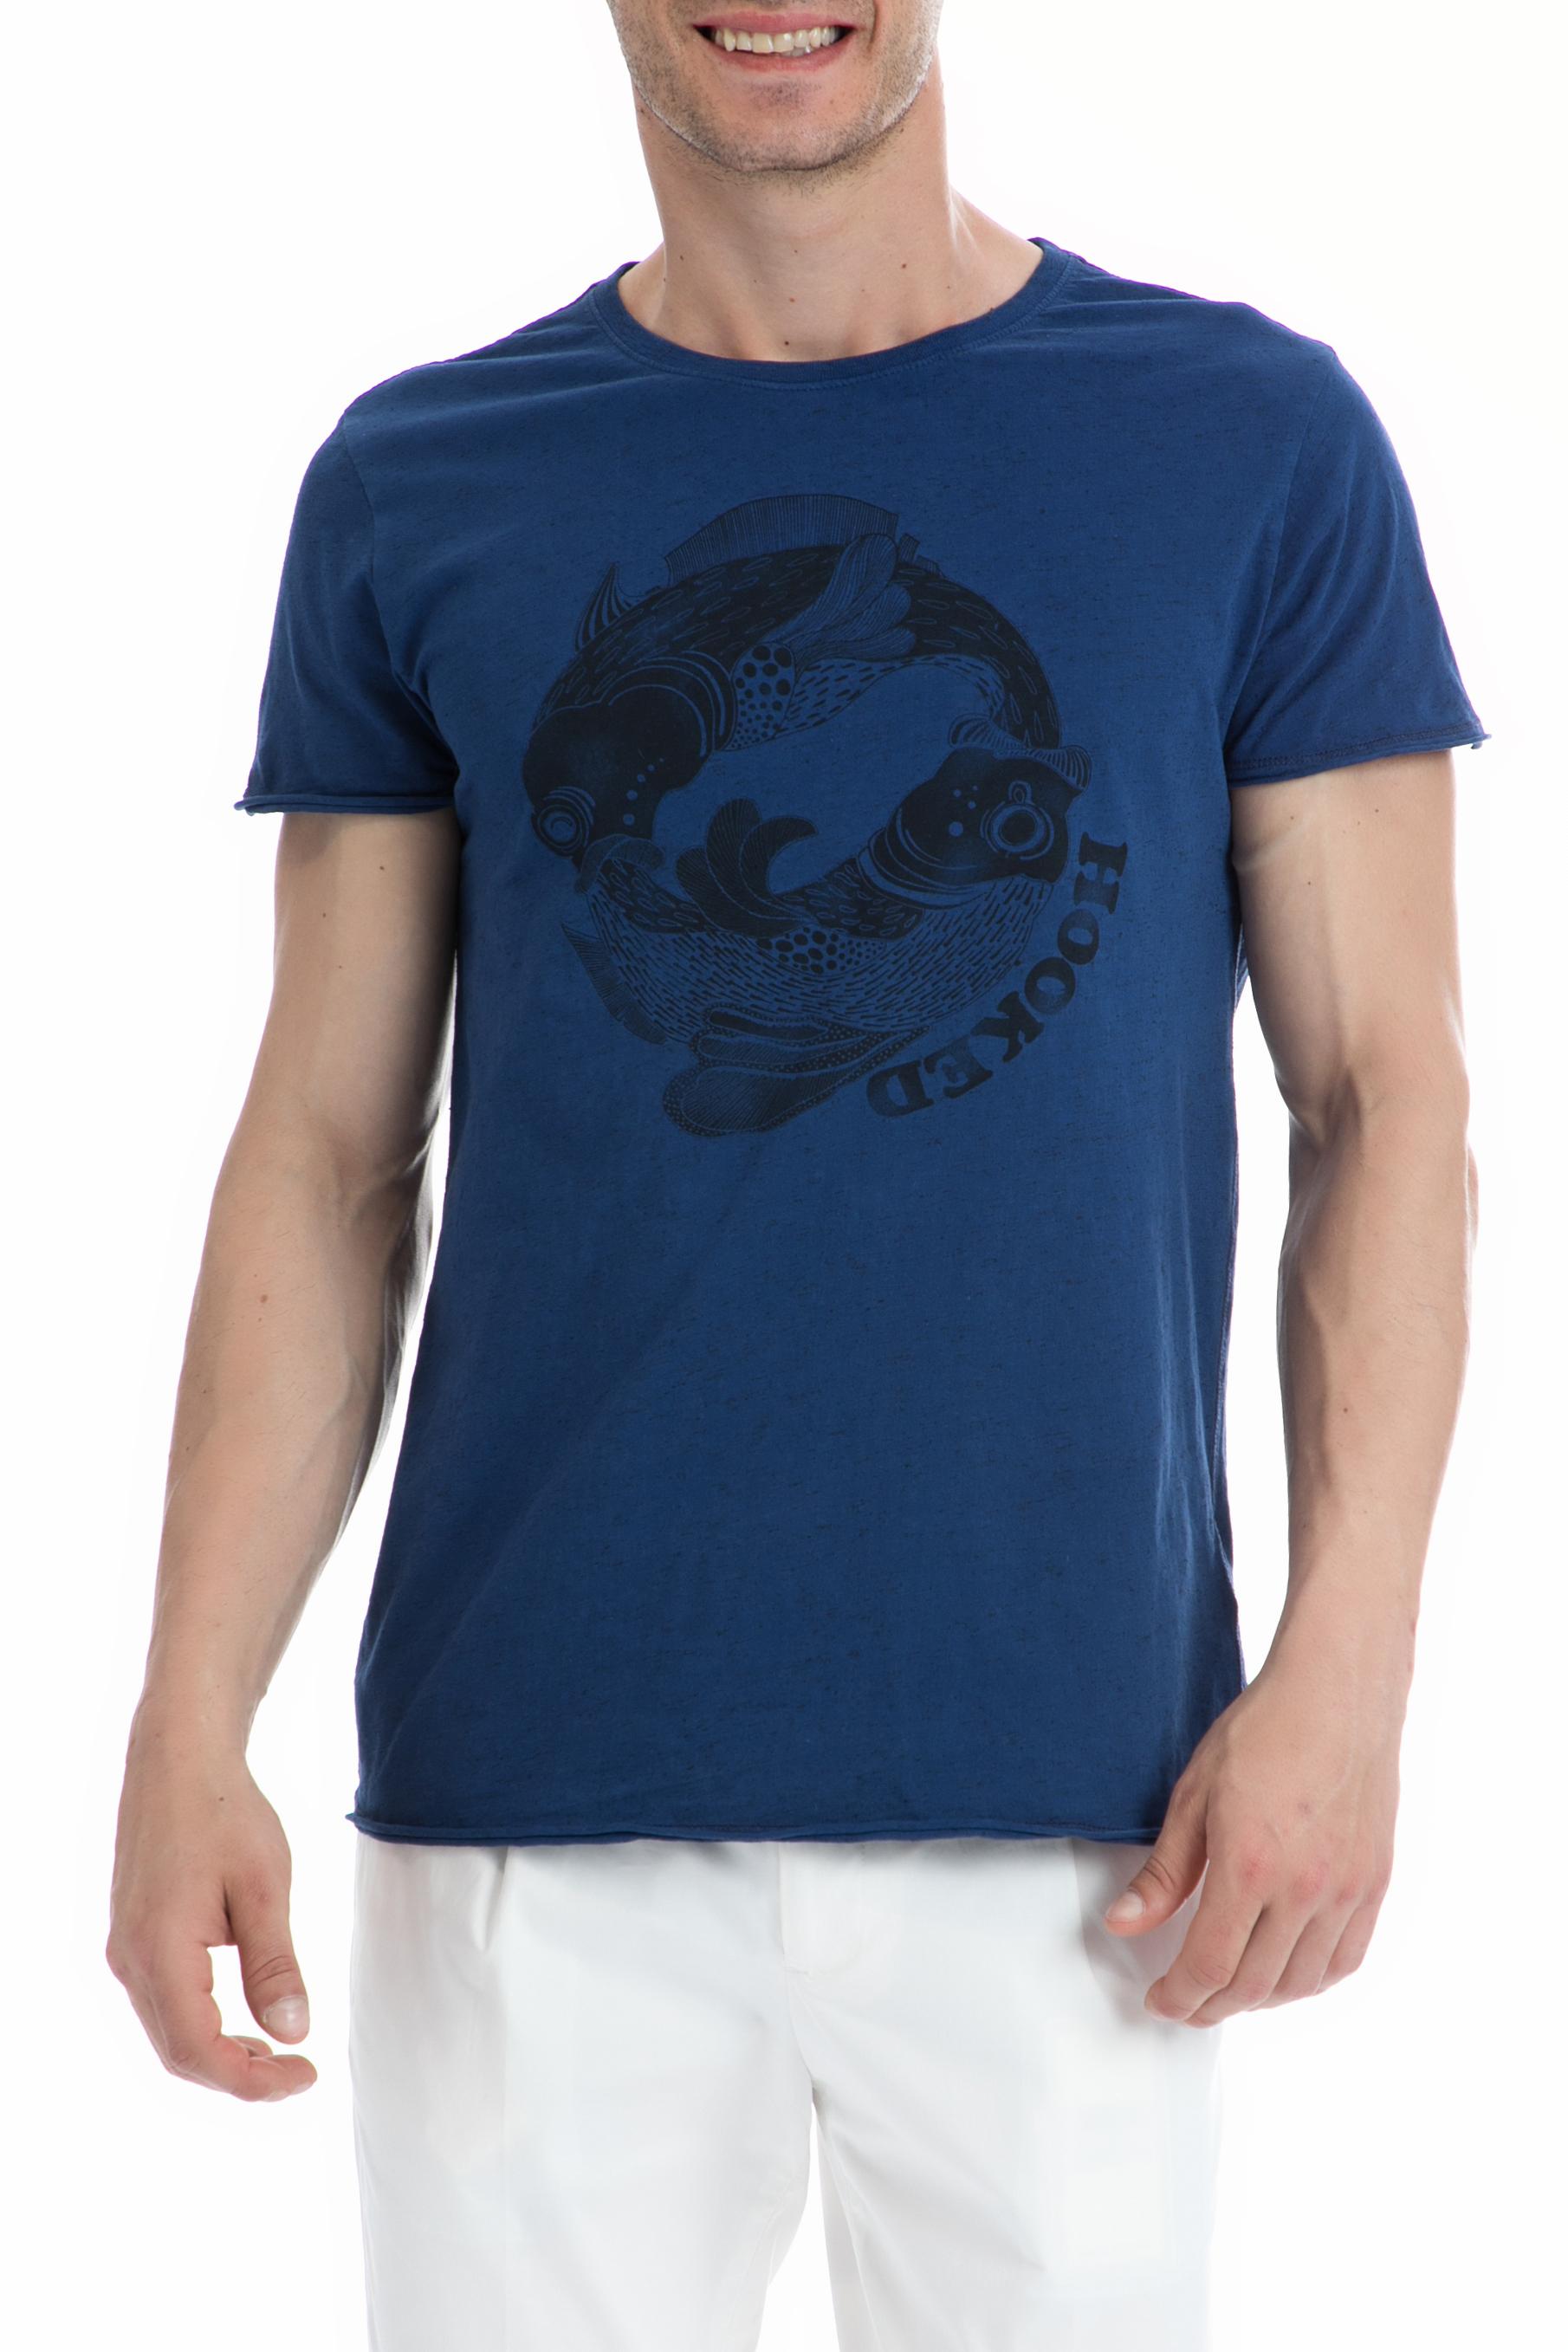 SCOTCH & SODA - Ανδρική μπλούζα SCOTCH & SODA μπλε ανδρικά ρούχα μπλούζες κοντομάνικες